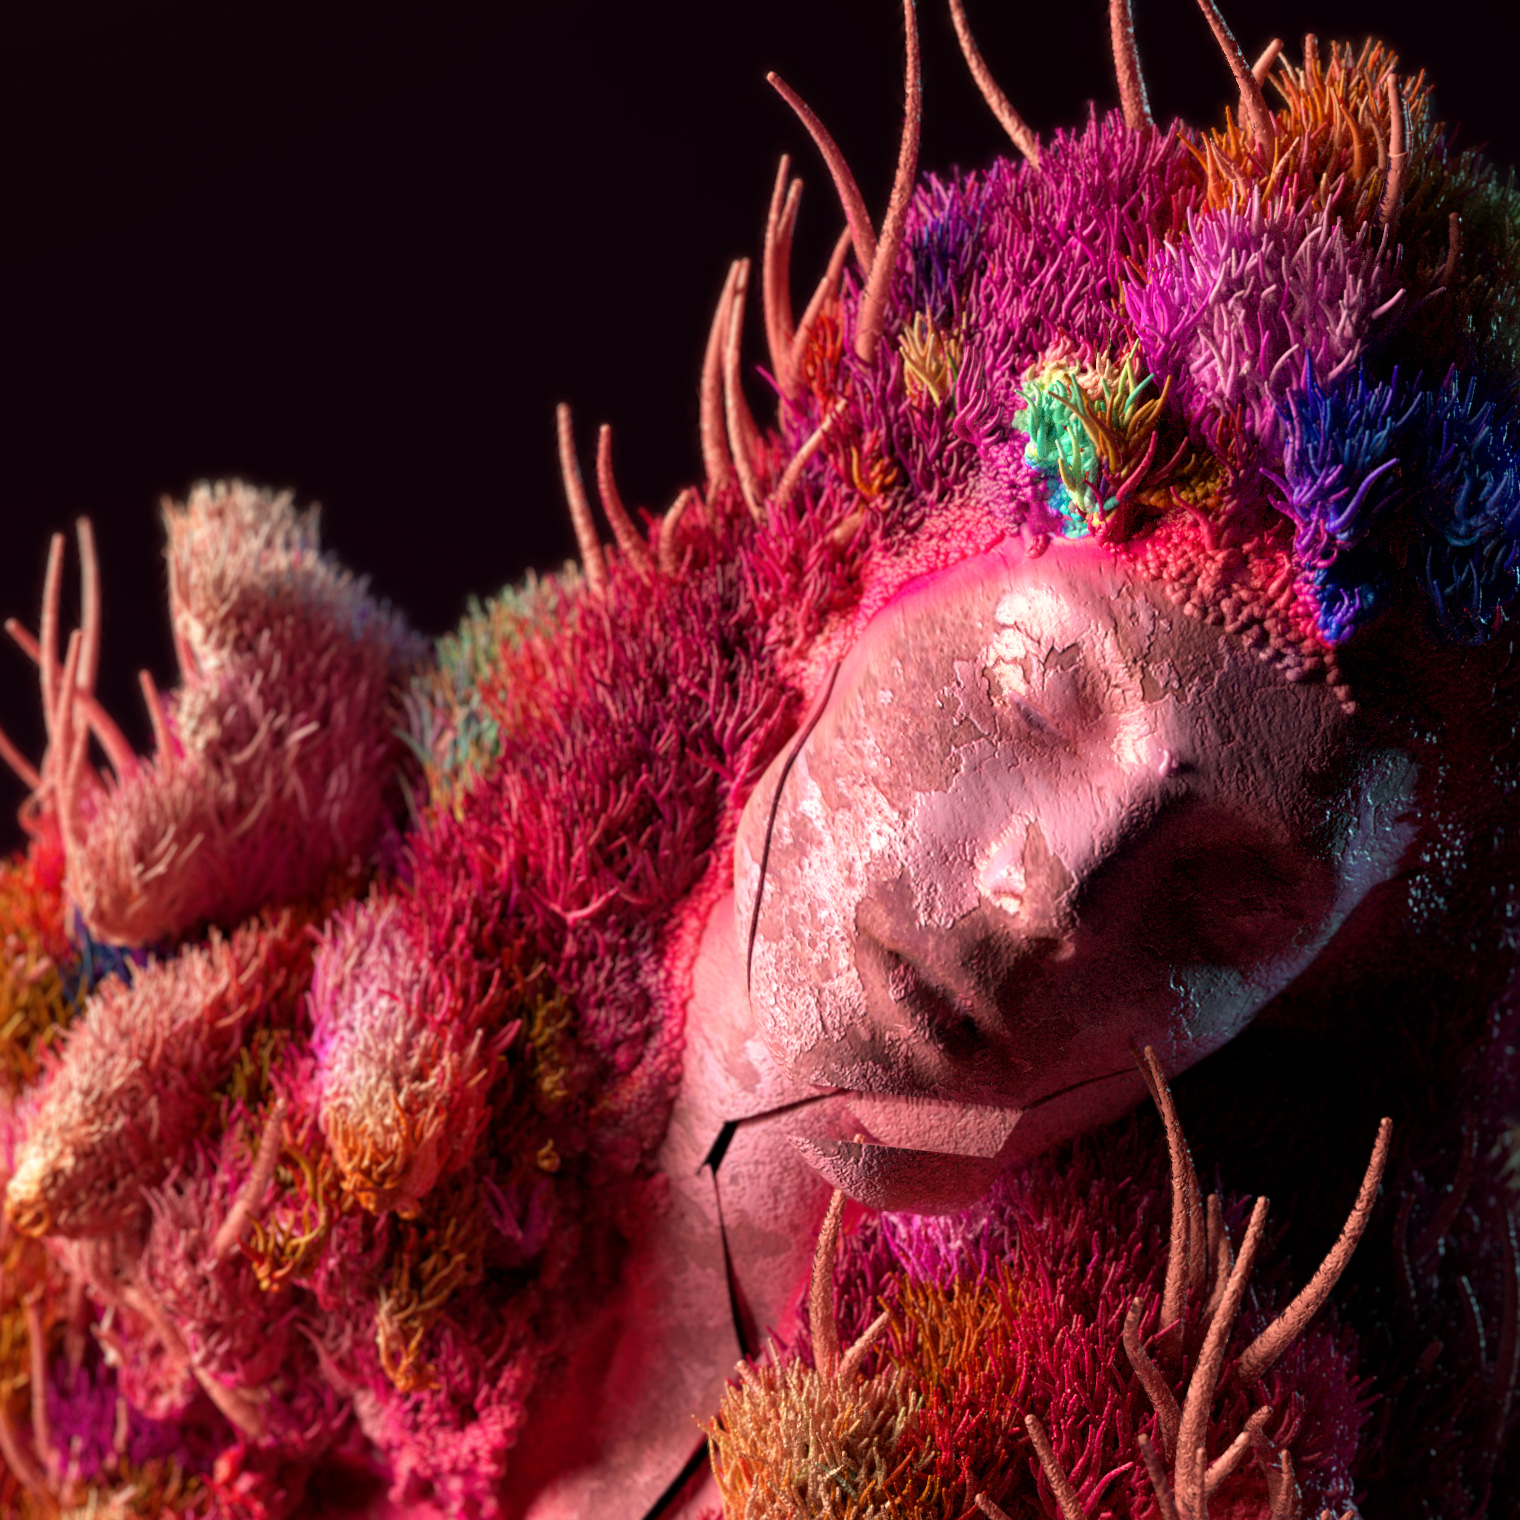 da coral pink_face crop